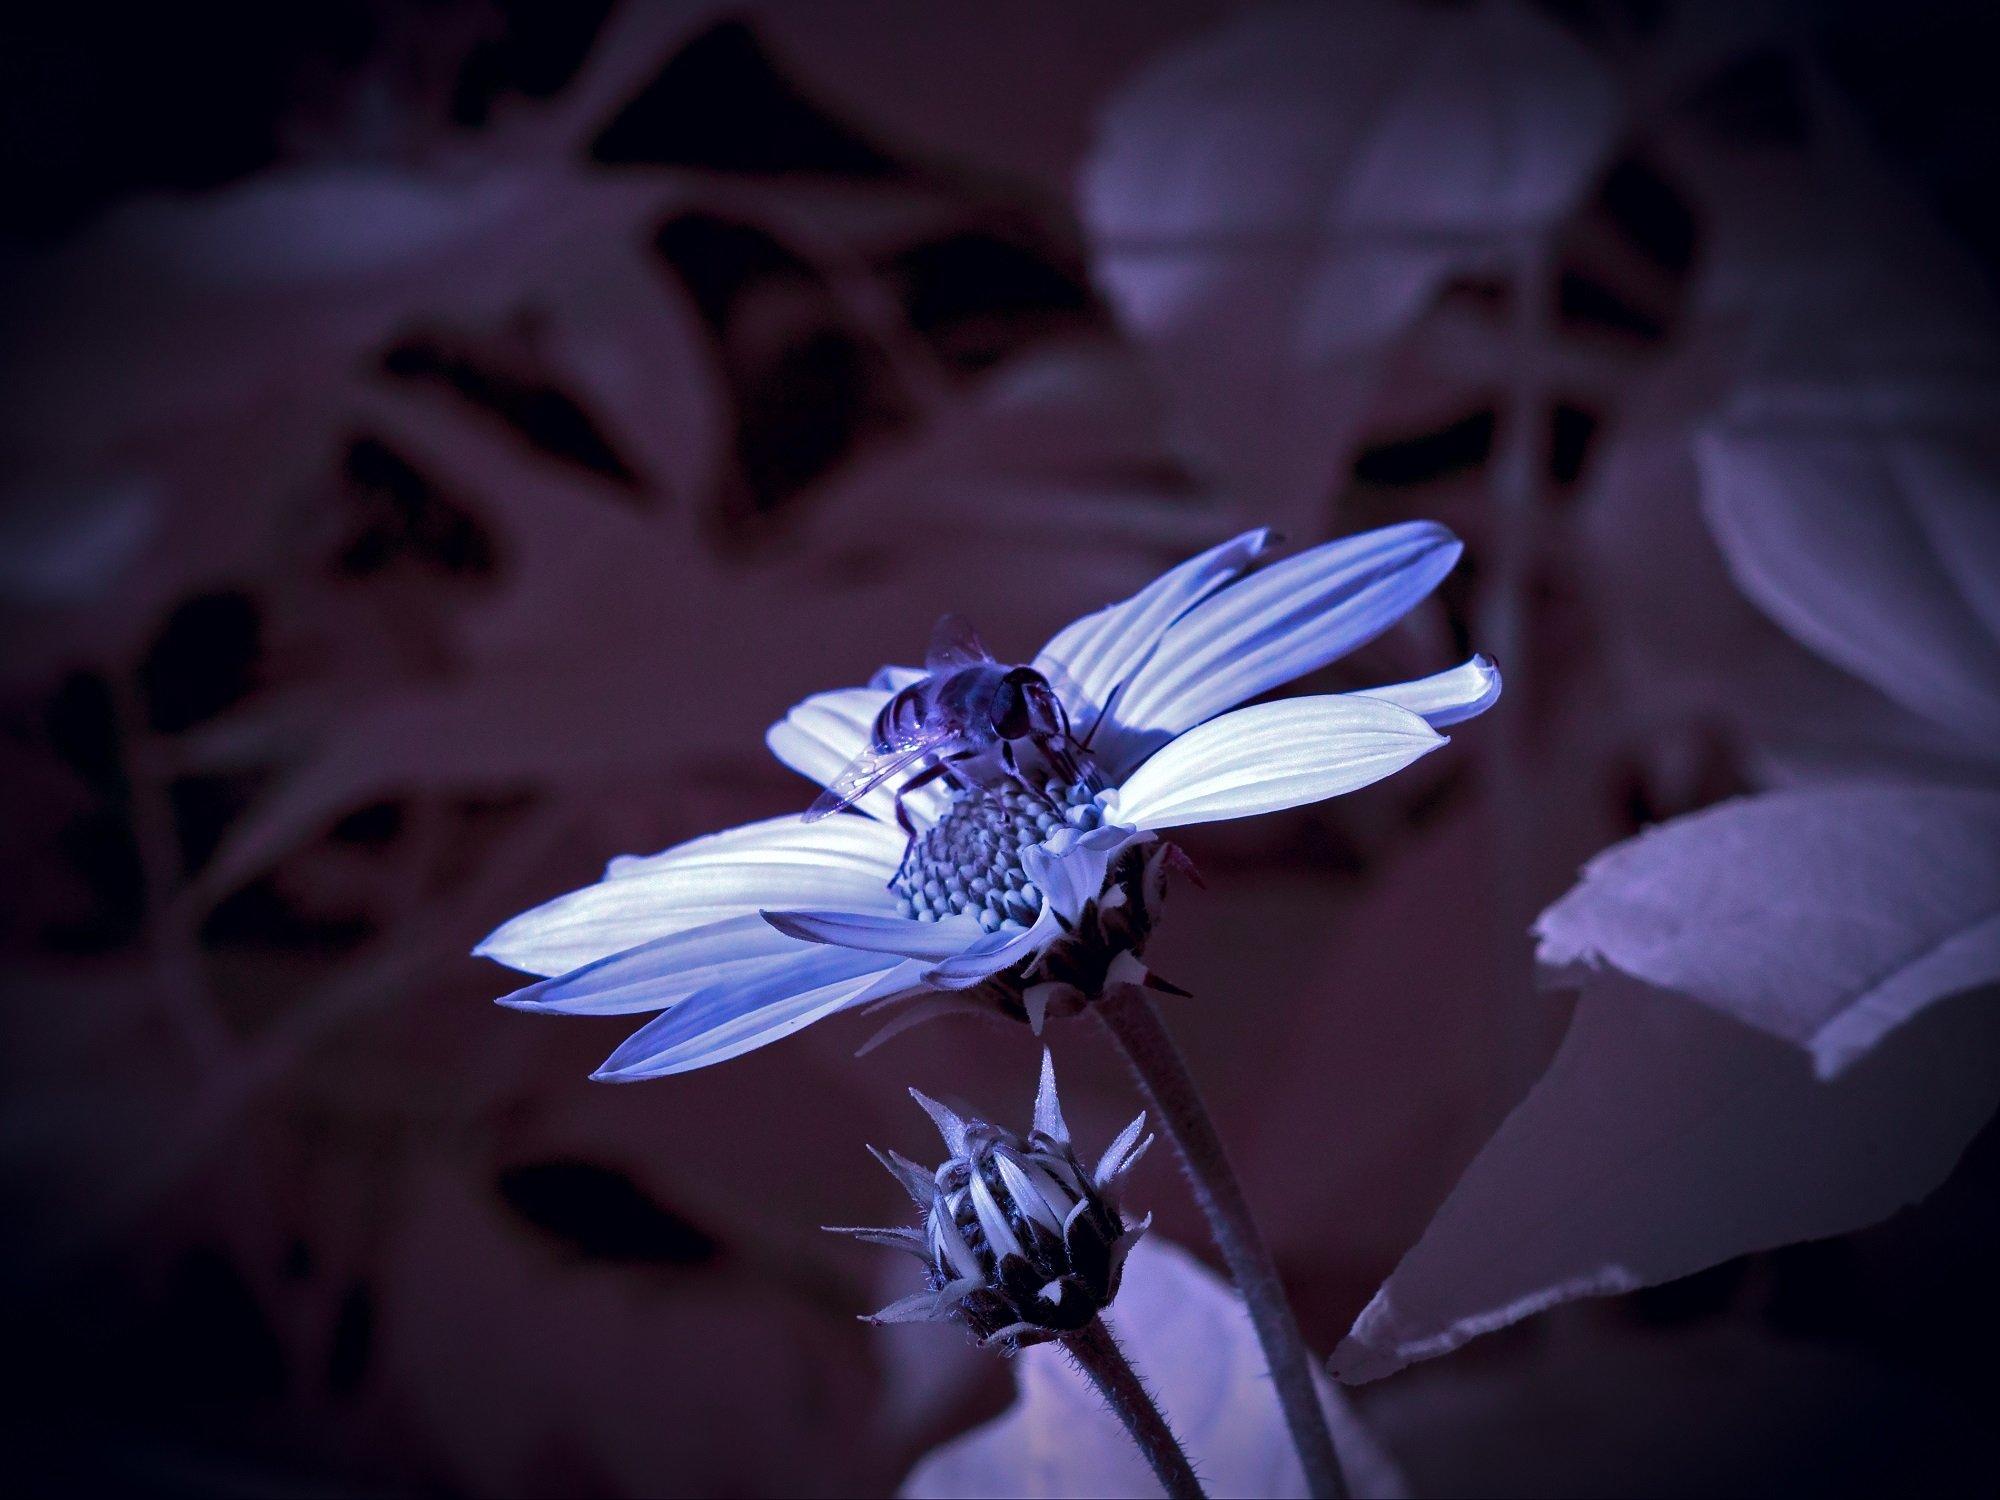 infrared,ик-фото,инфракрасное фото,инфракрасная фотография,природа,беларусь,осень, Sixten ( Сергей )